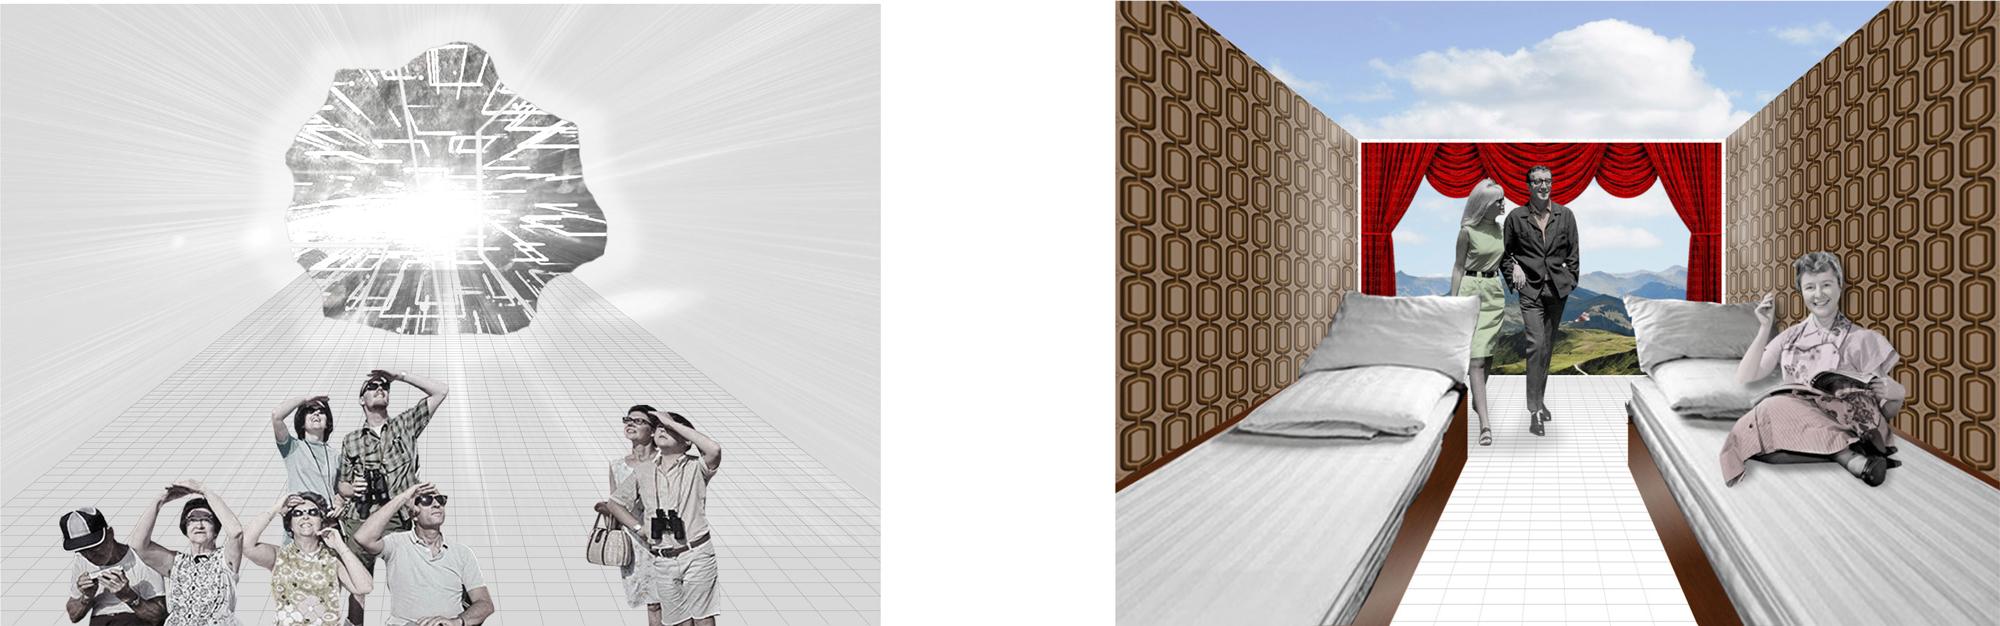 reinventer - paris- noc 42 - xavier - niel - ar - Studio - architectures - ecole 42   Kwame YAMGNANE nicolas sadirac - free (13).jpg